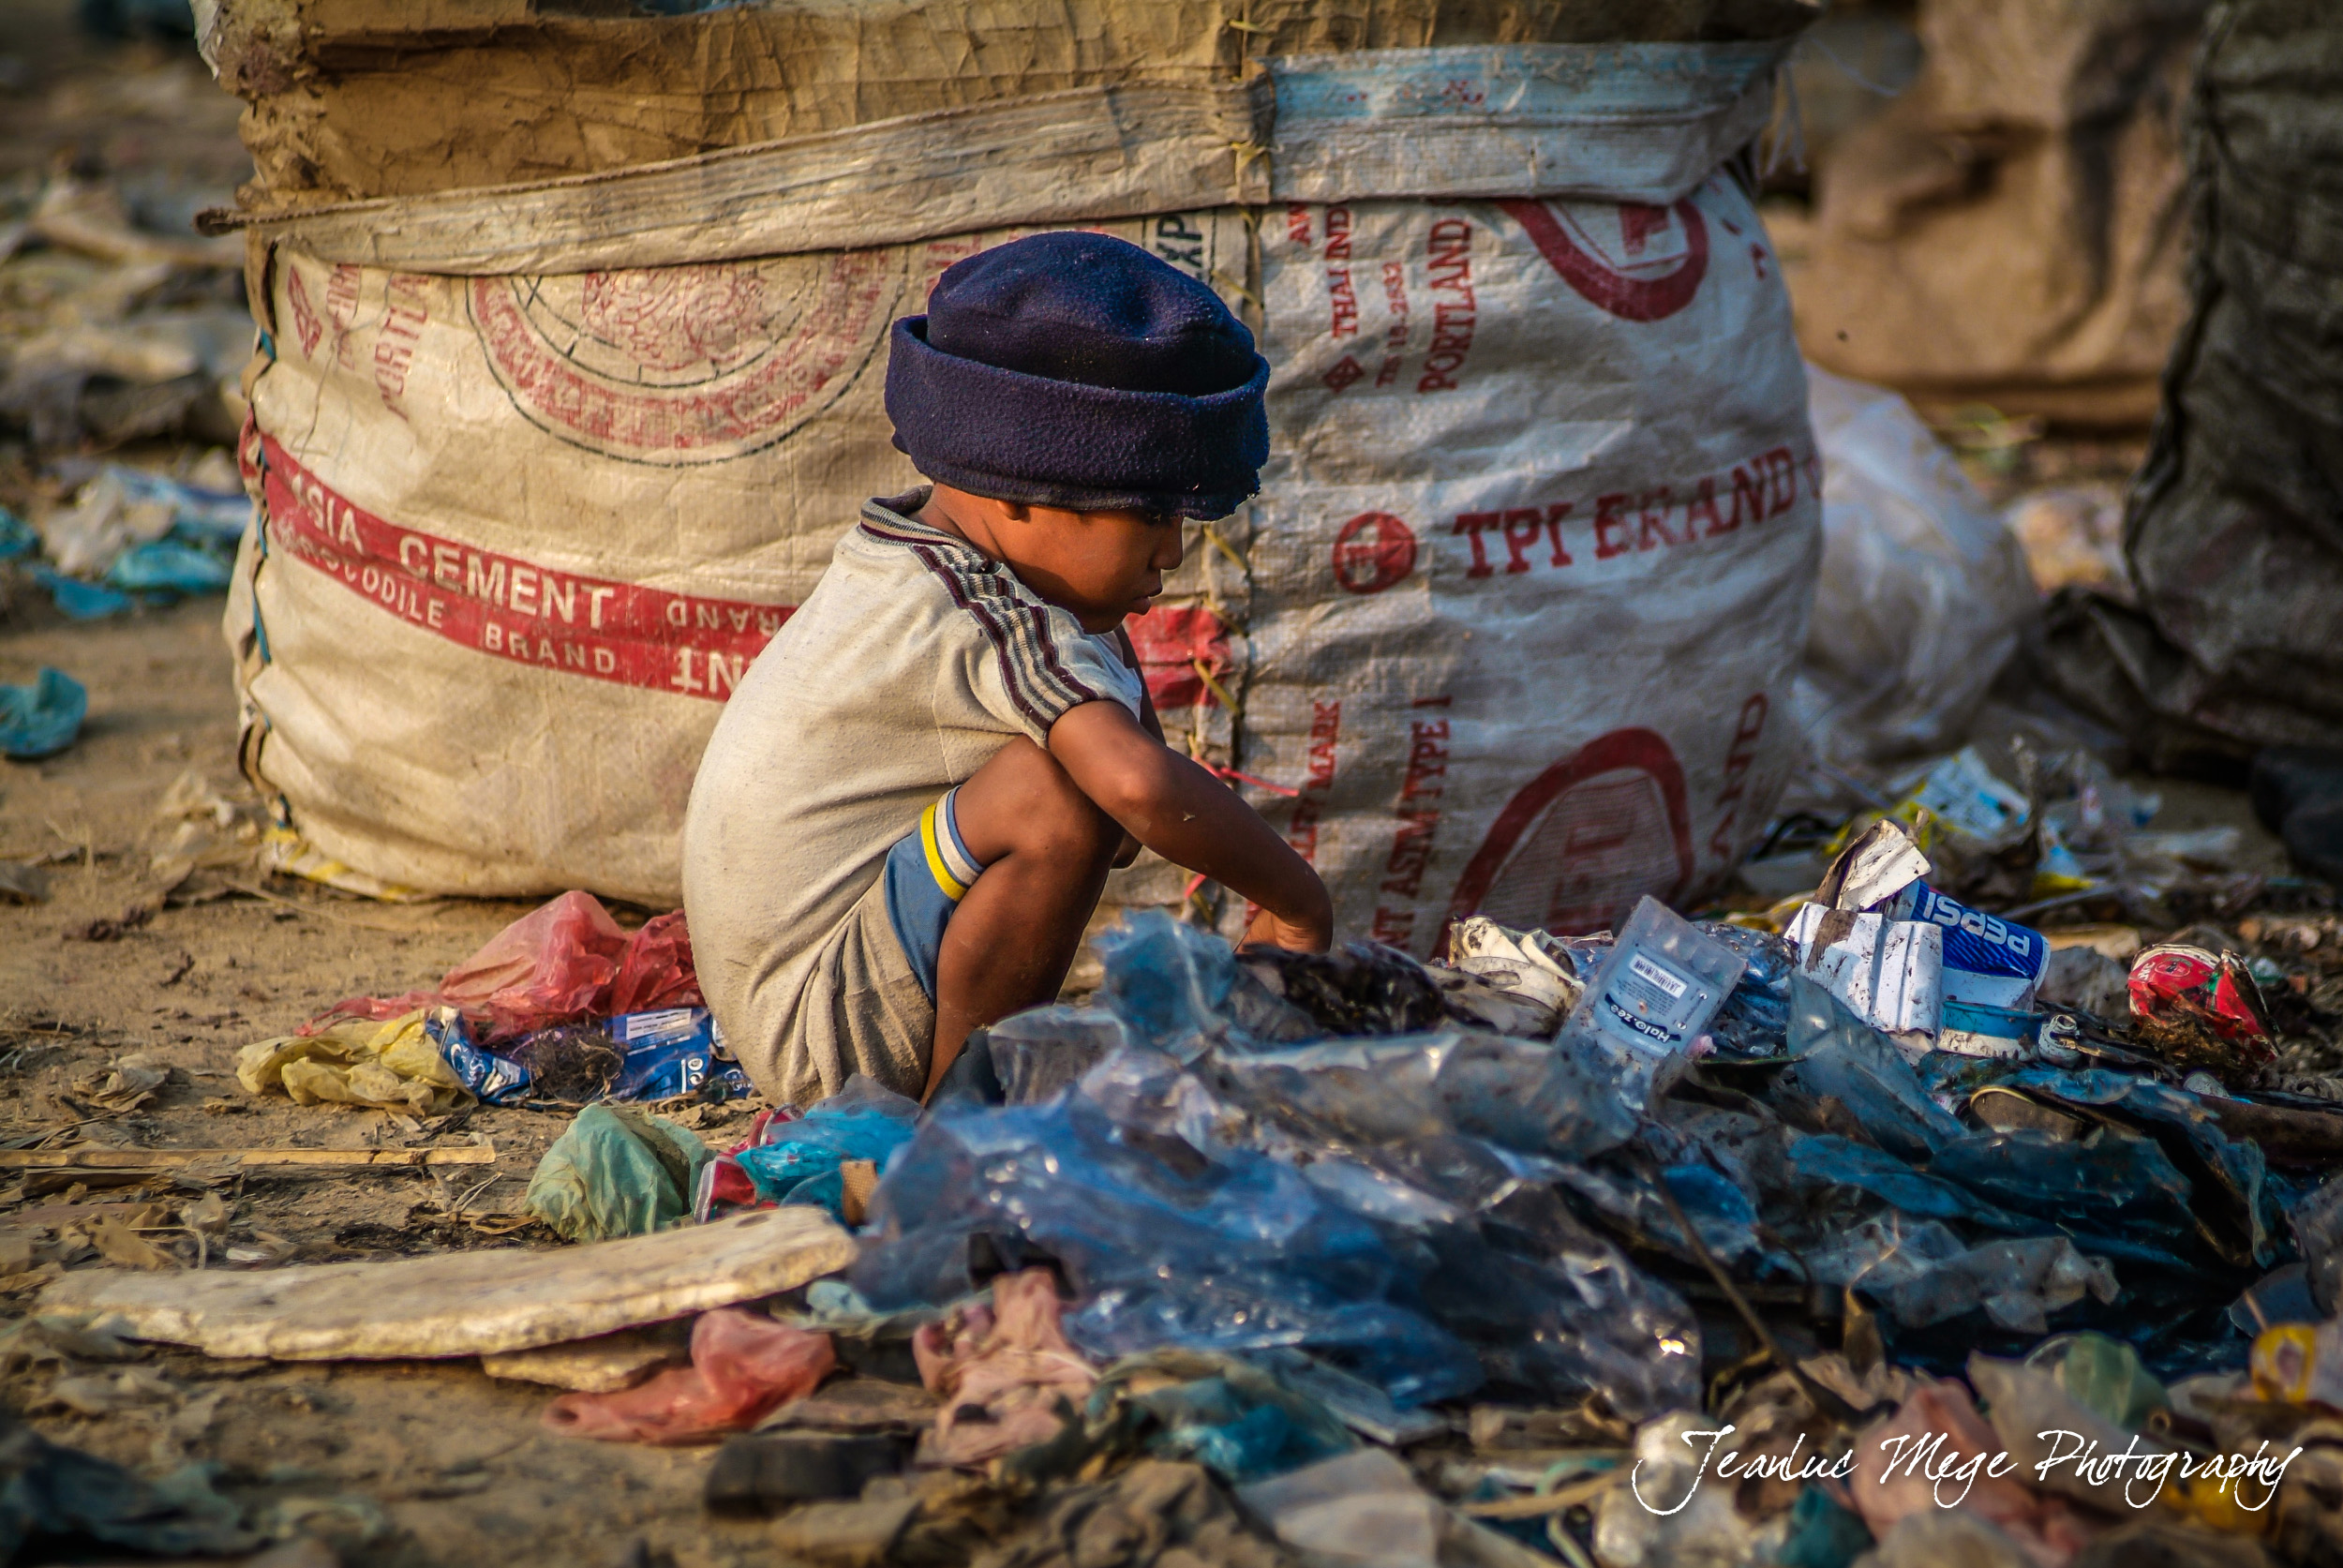 Jean Luc Mege Cambodia-9246.jpg